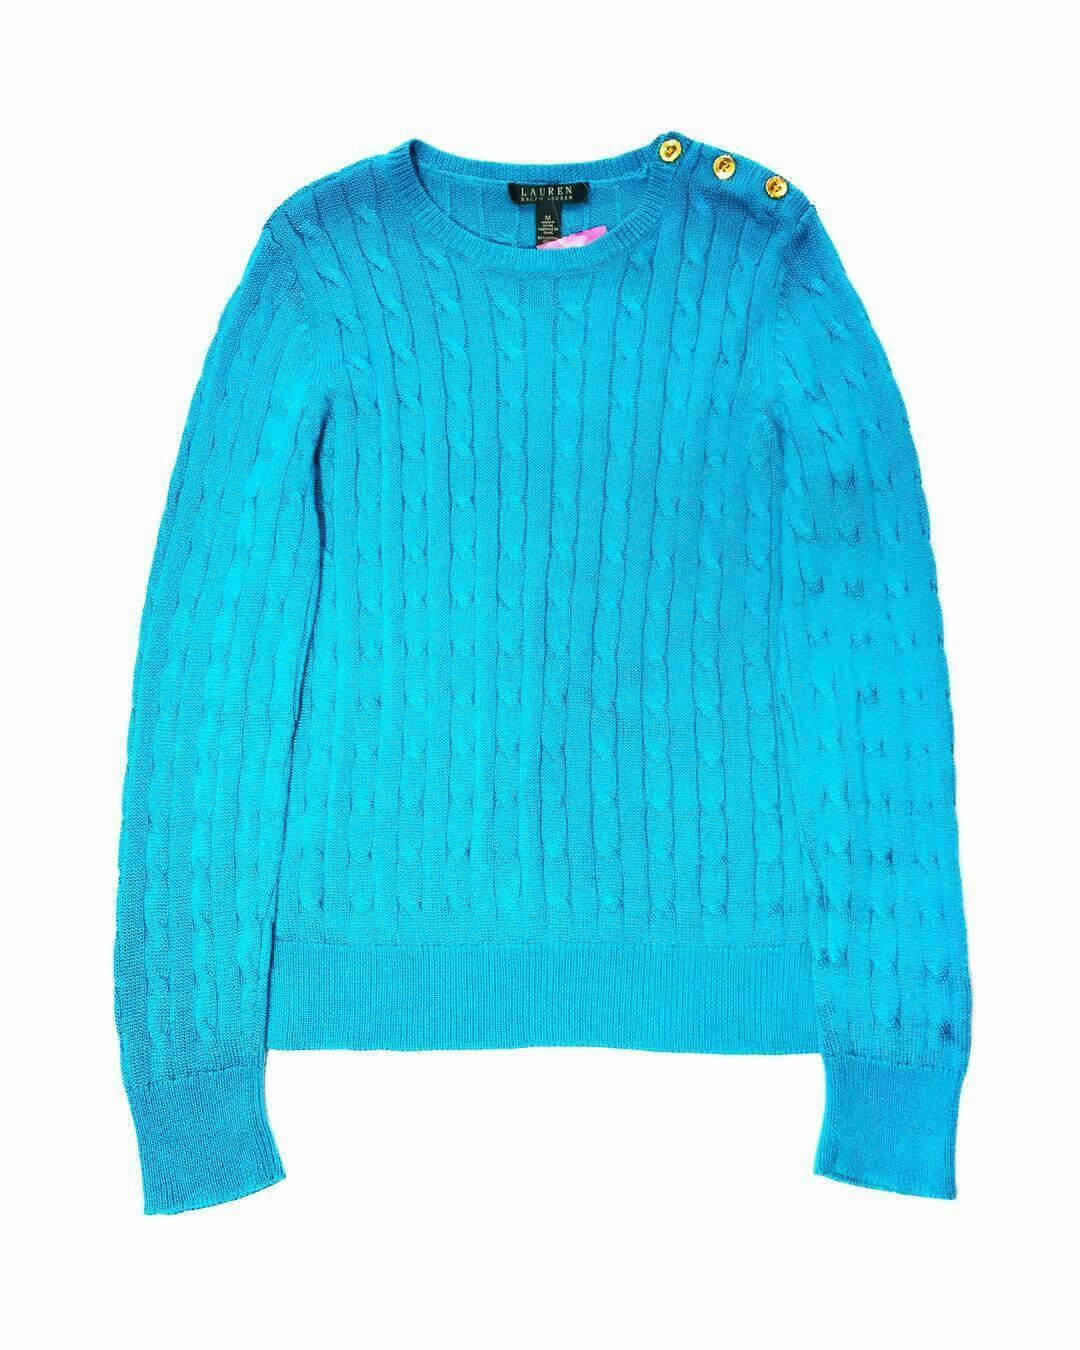 Женский пуловер от Ralph Lauren